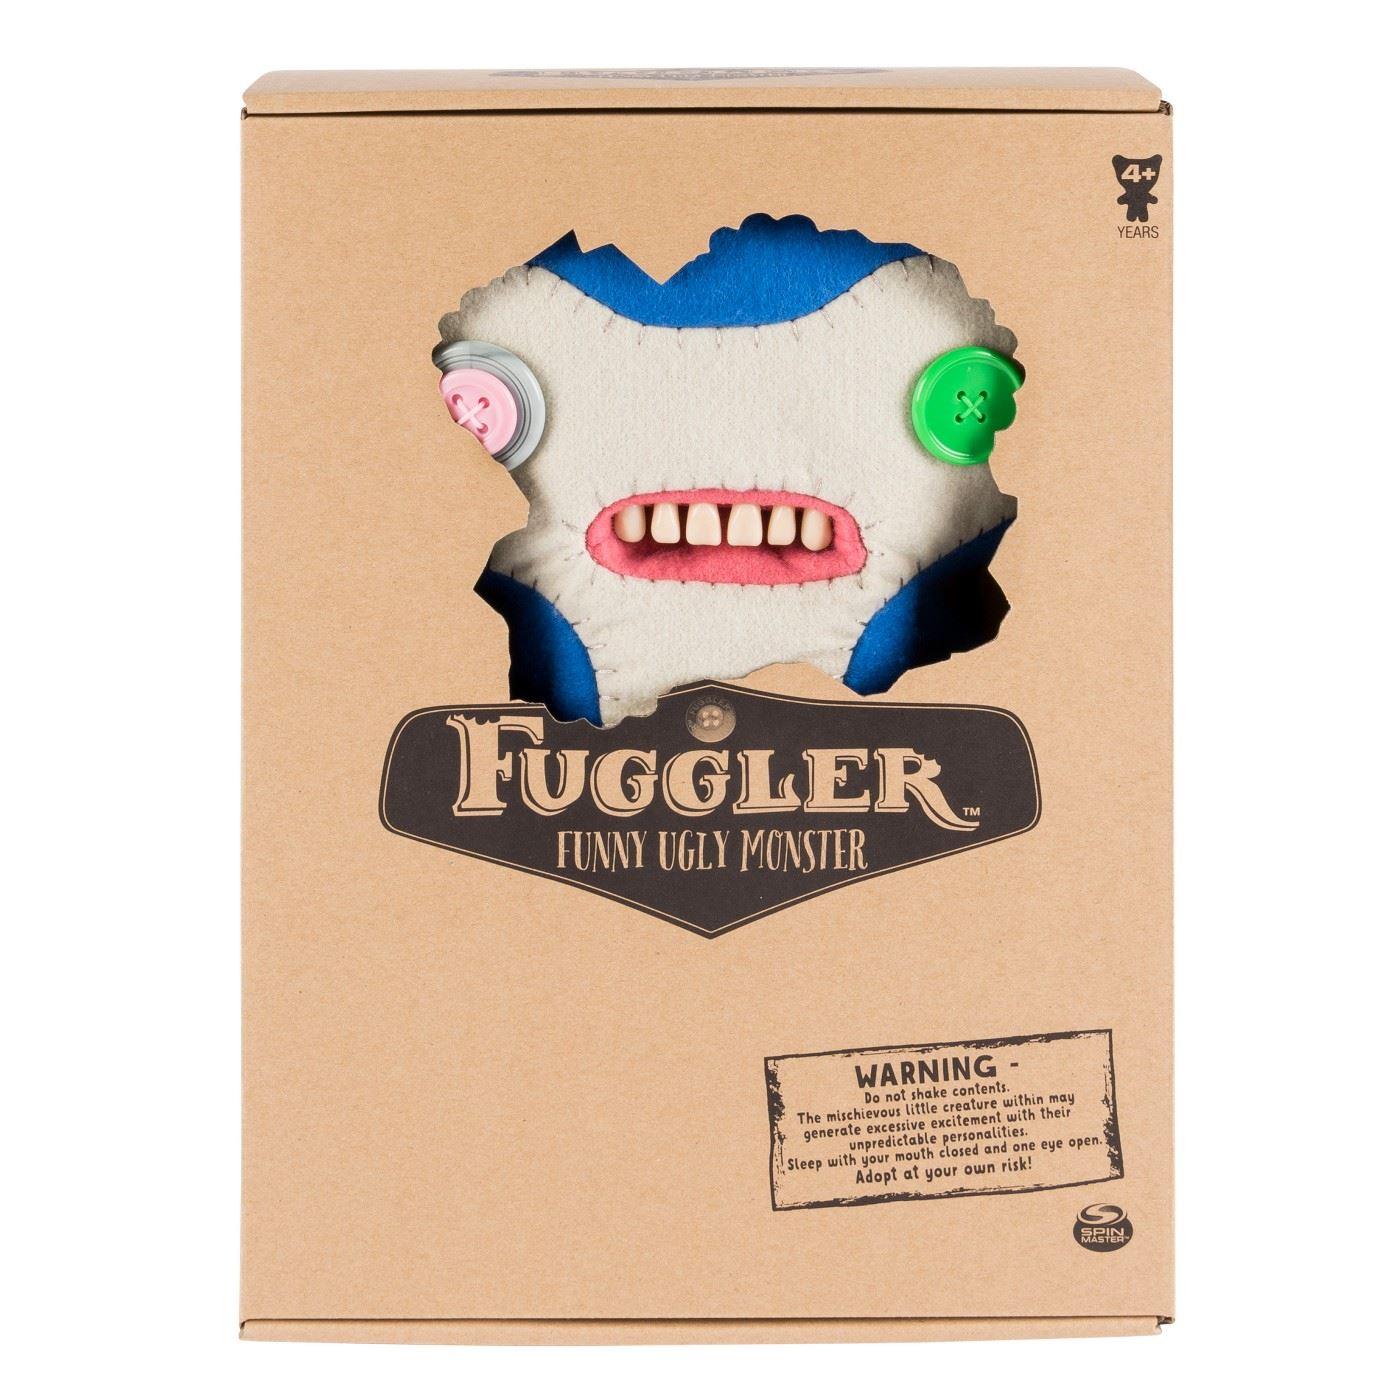 Fuggler-Funny-Uggly-Monsters-Blue-Red-Purple-Light-Red-Stuffed-Animal 縮圖 4